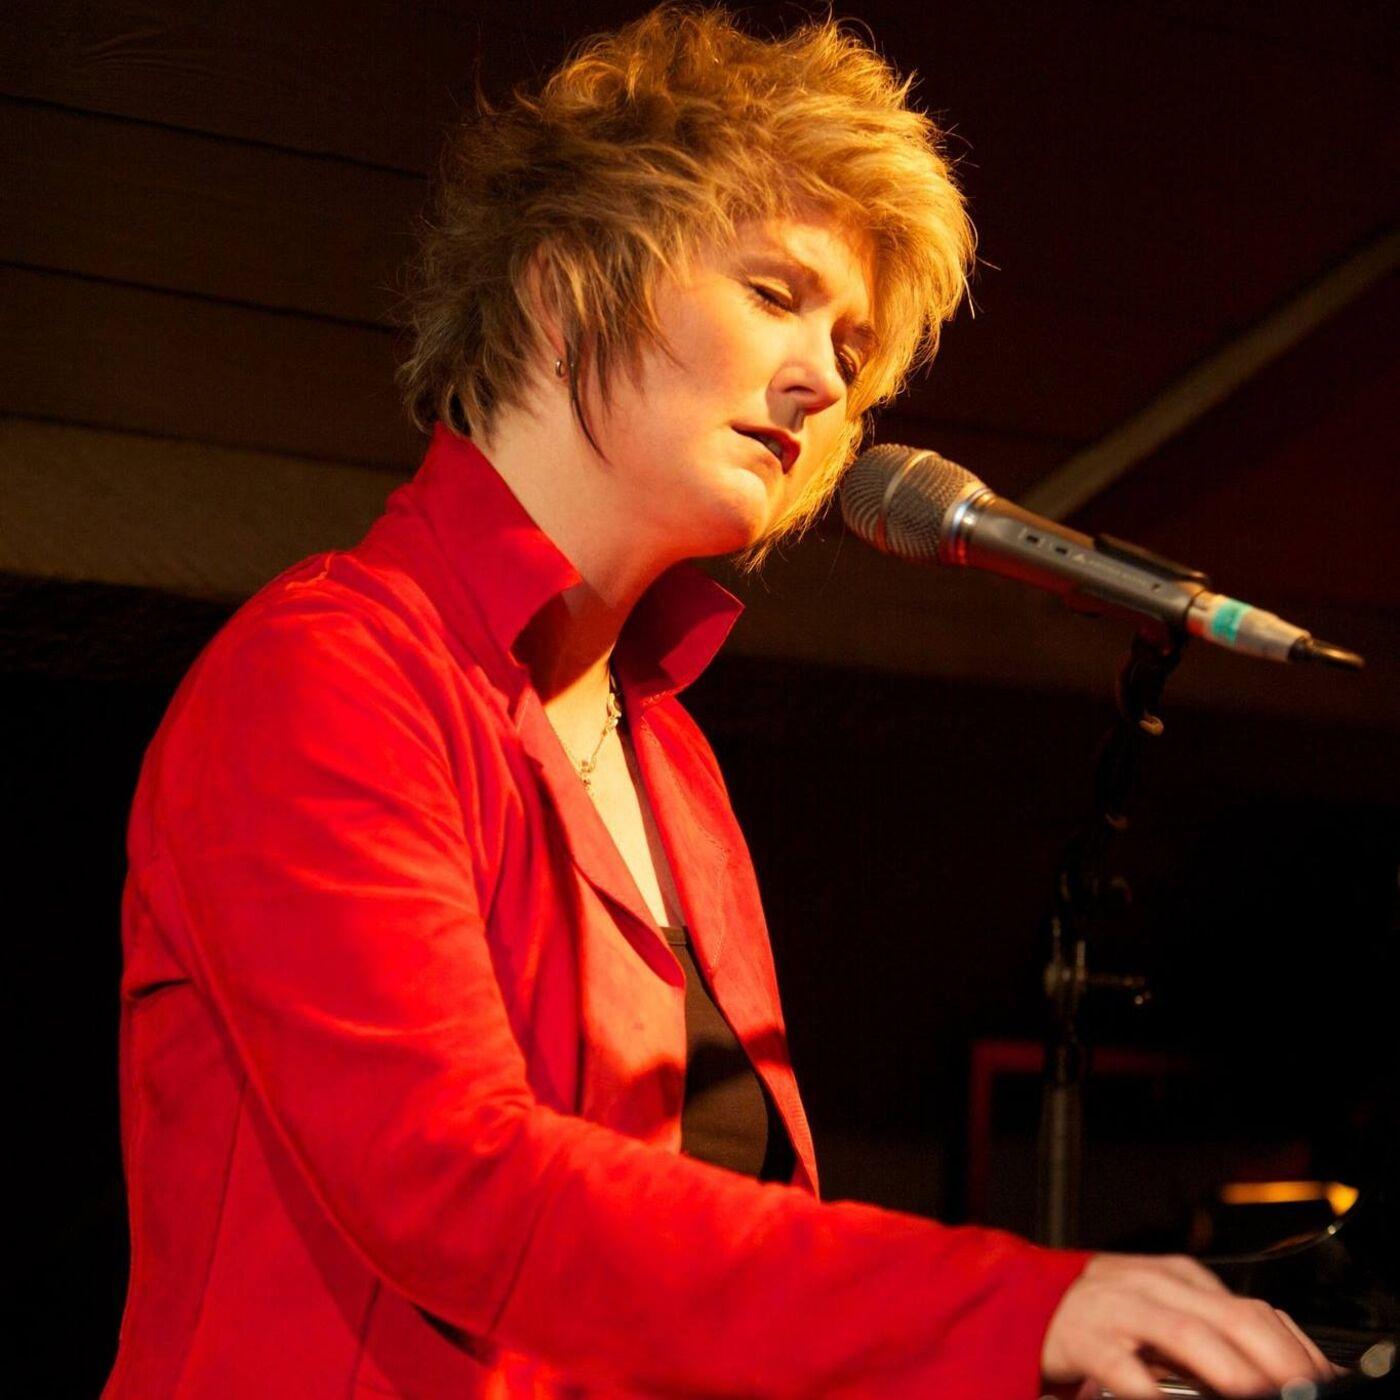 Episode 13 - A conversation with vocalist/pianist Dena DeRose